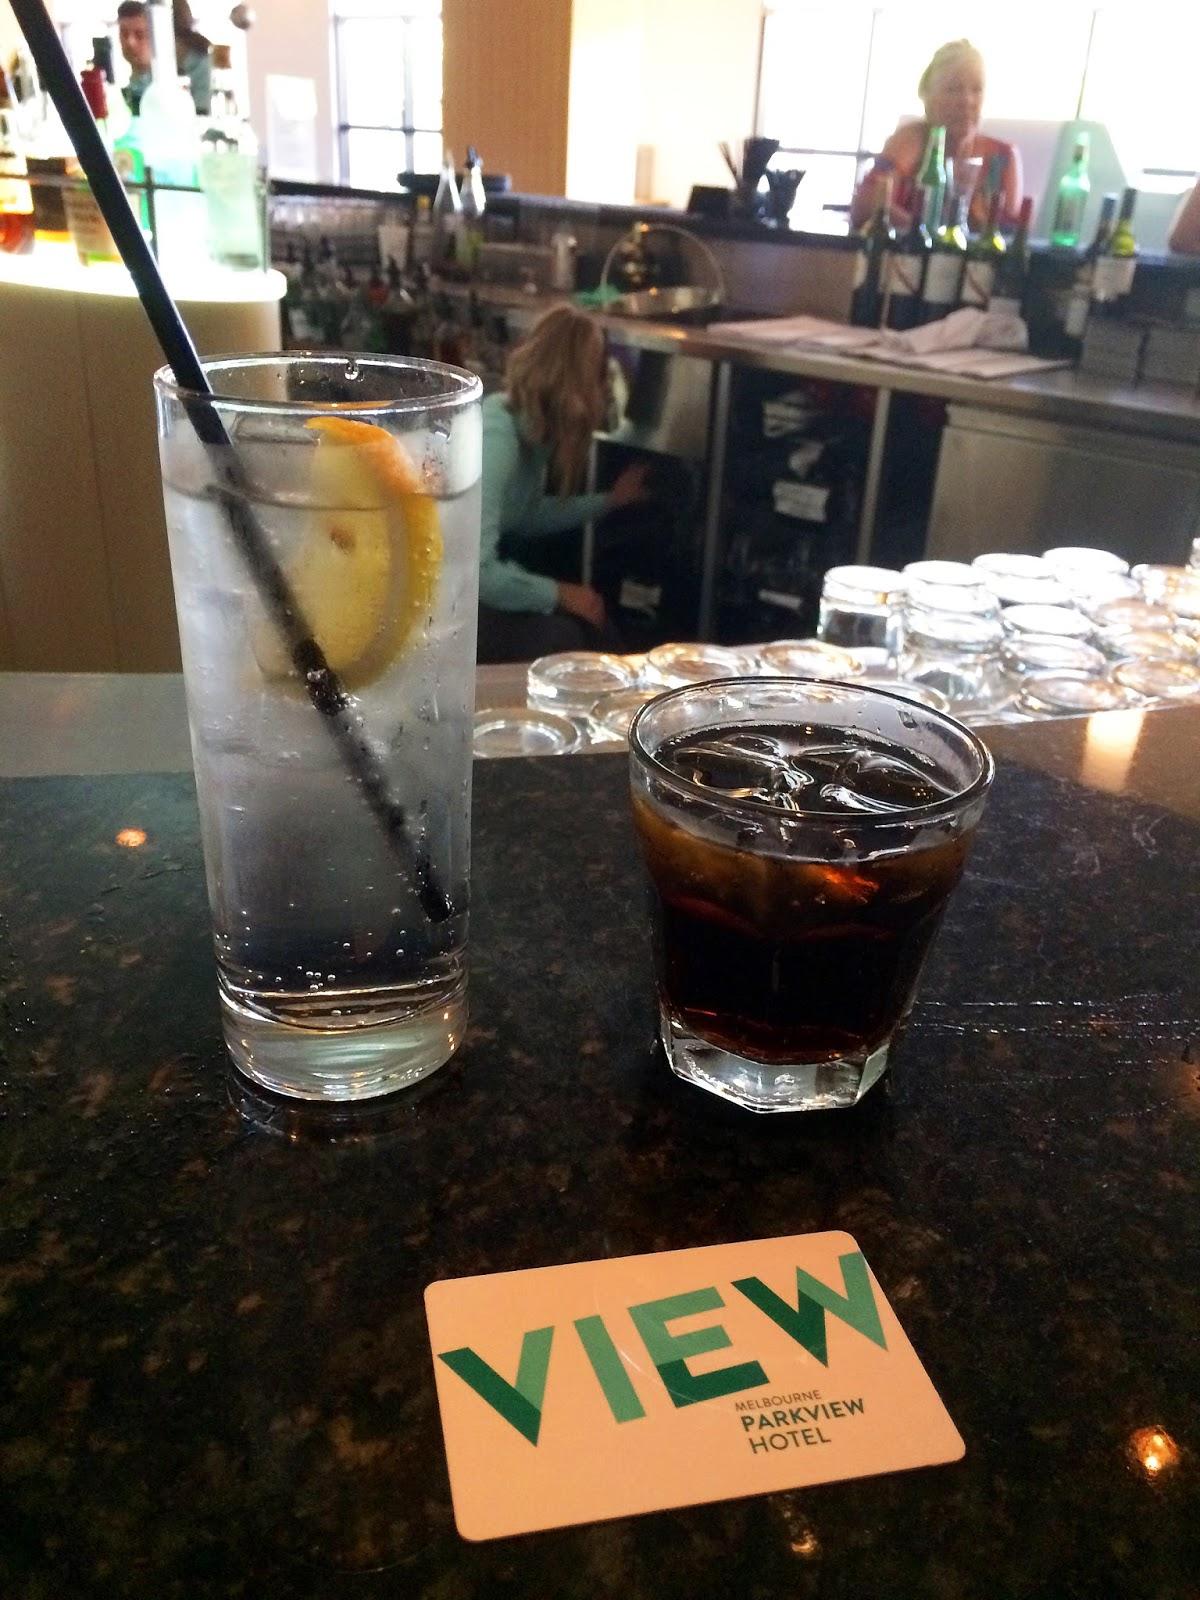 Melbourne Parkview Hotel Drinks at Bar